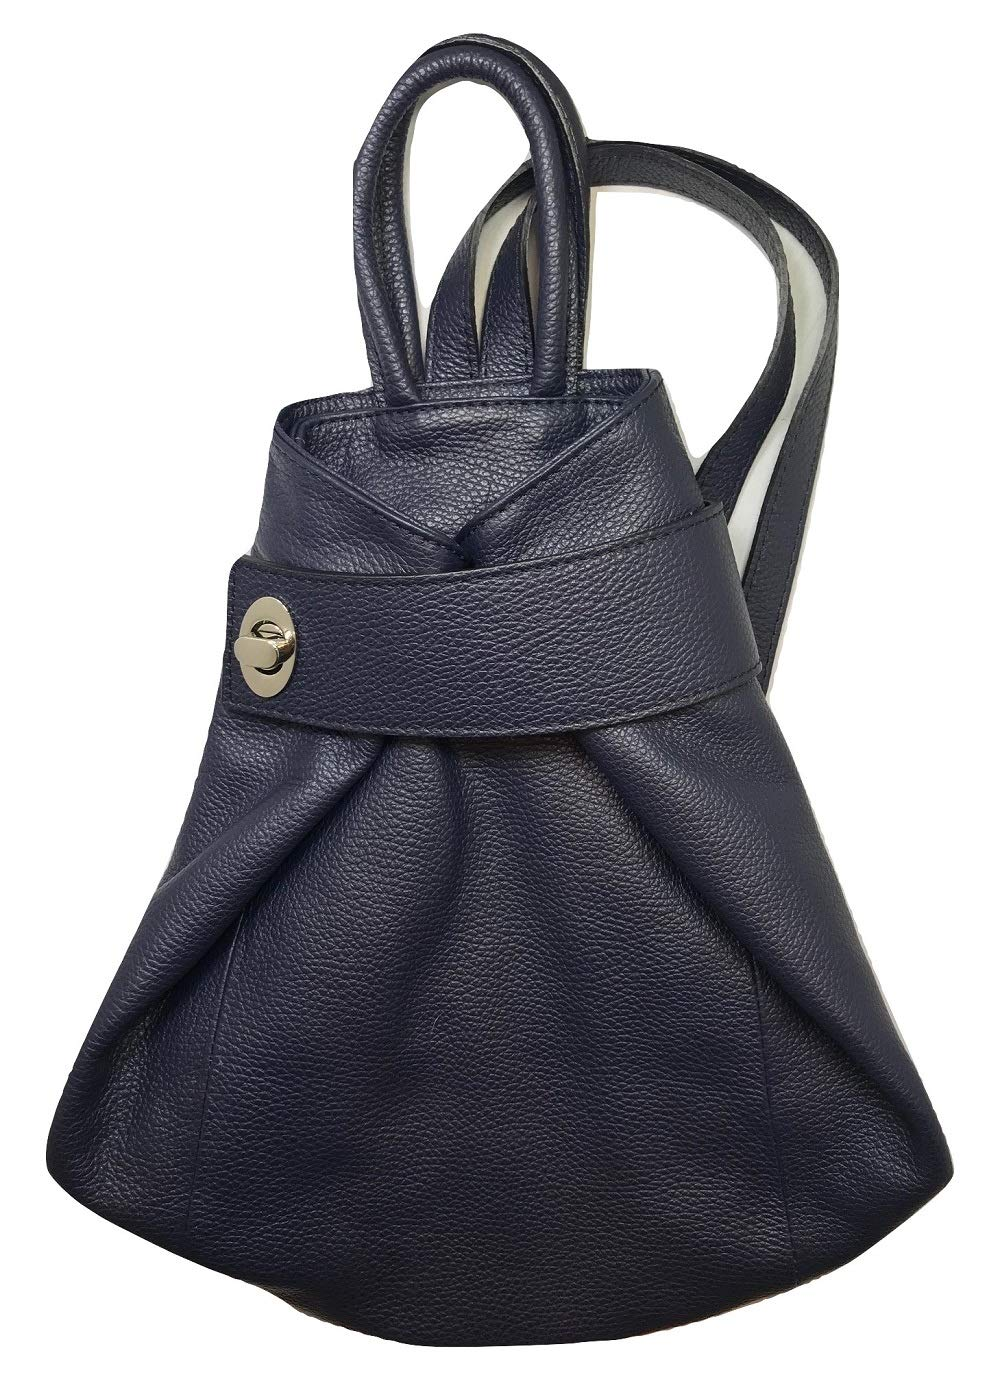 LaGaksta Stella Italian Leather Backpack Convertible Top Handle Purse Medium Blue